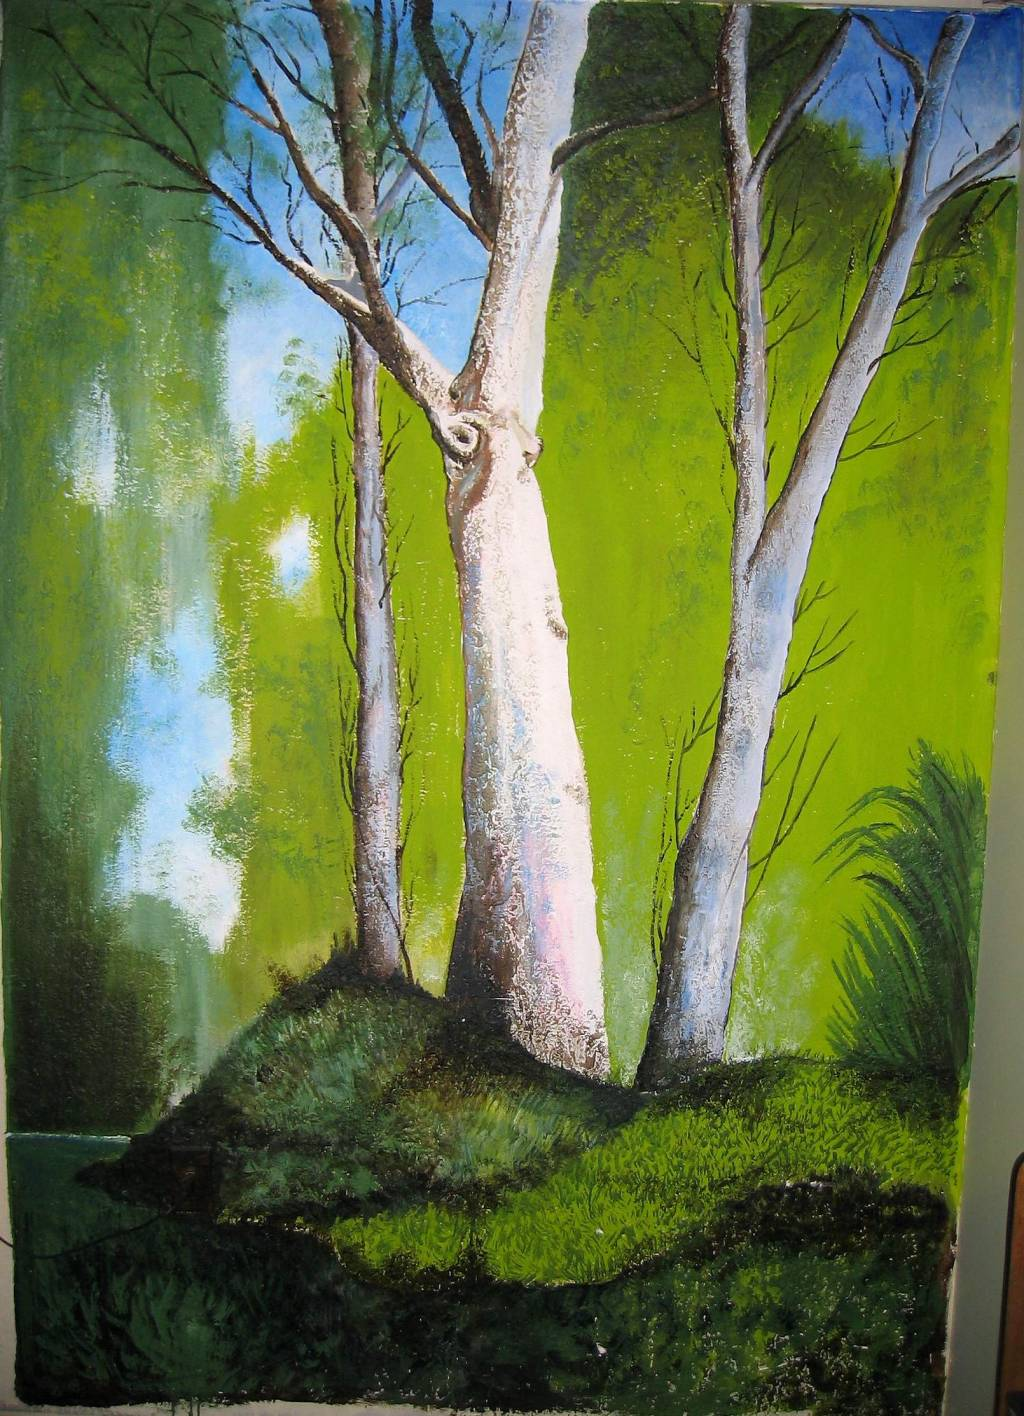 Mural paisaje ruben balbis fernandez for Murales de pared de paisajes